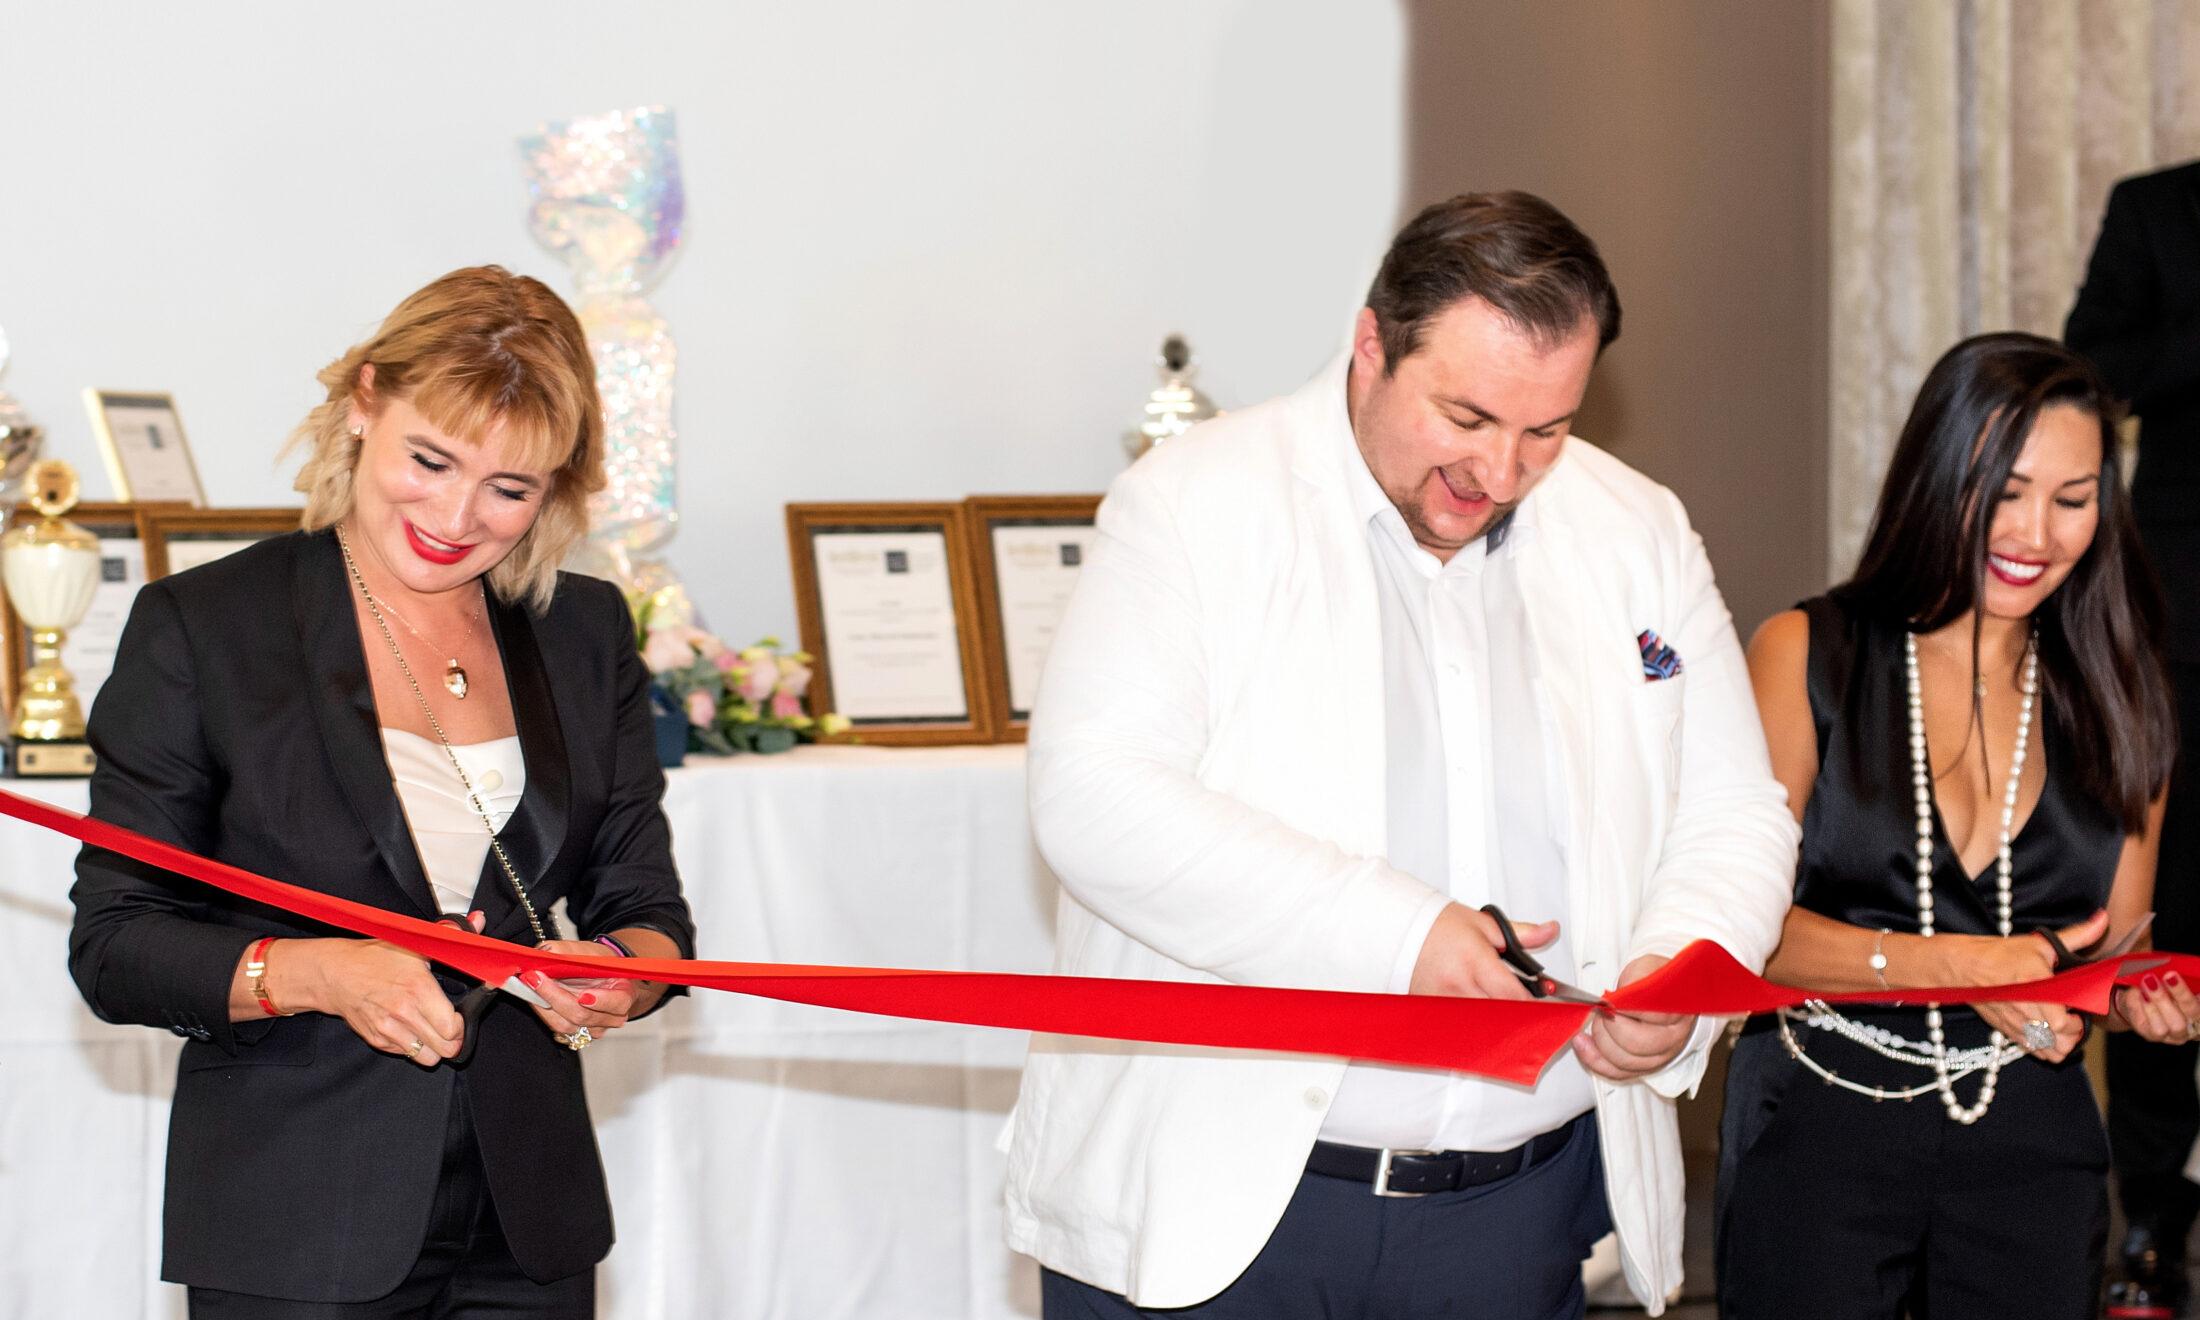 Anna Stukkert, Sergej Tschernjawskij, Gulshat Uzenbaeva